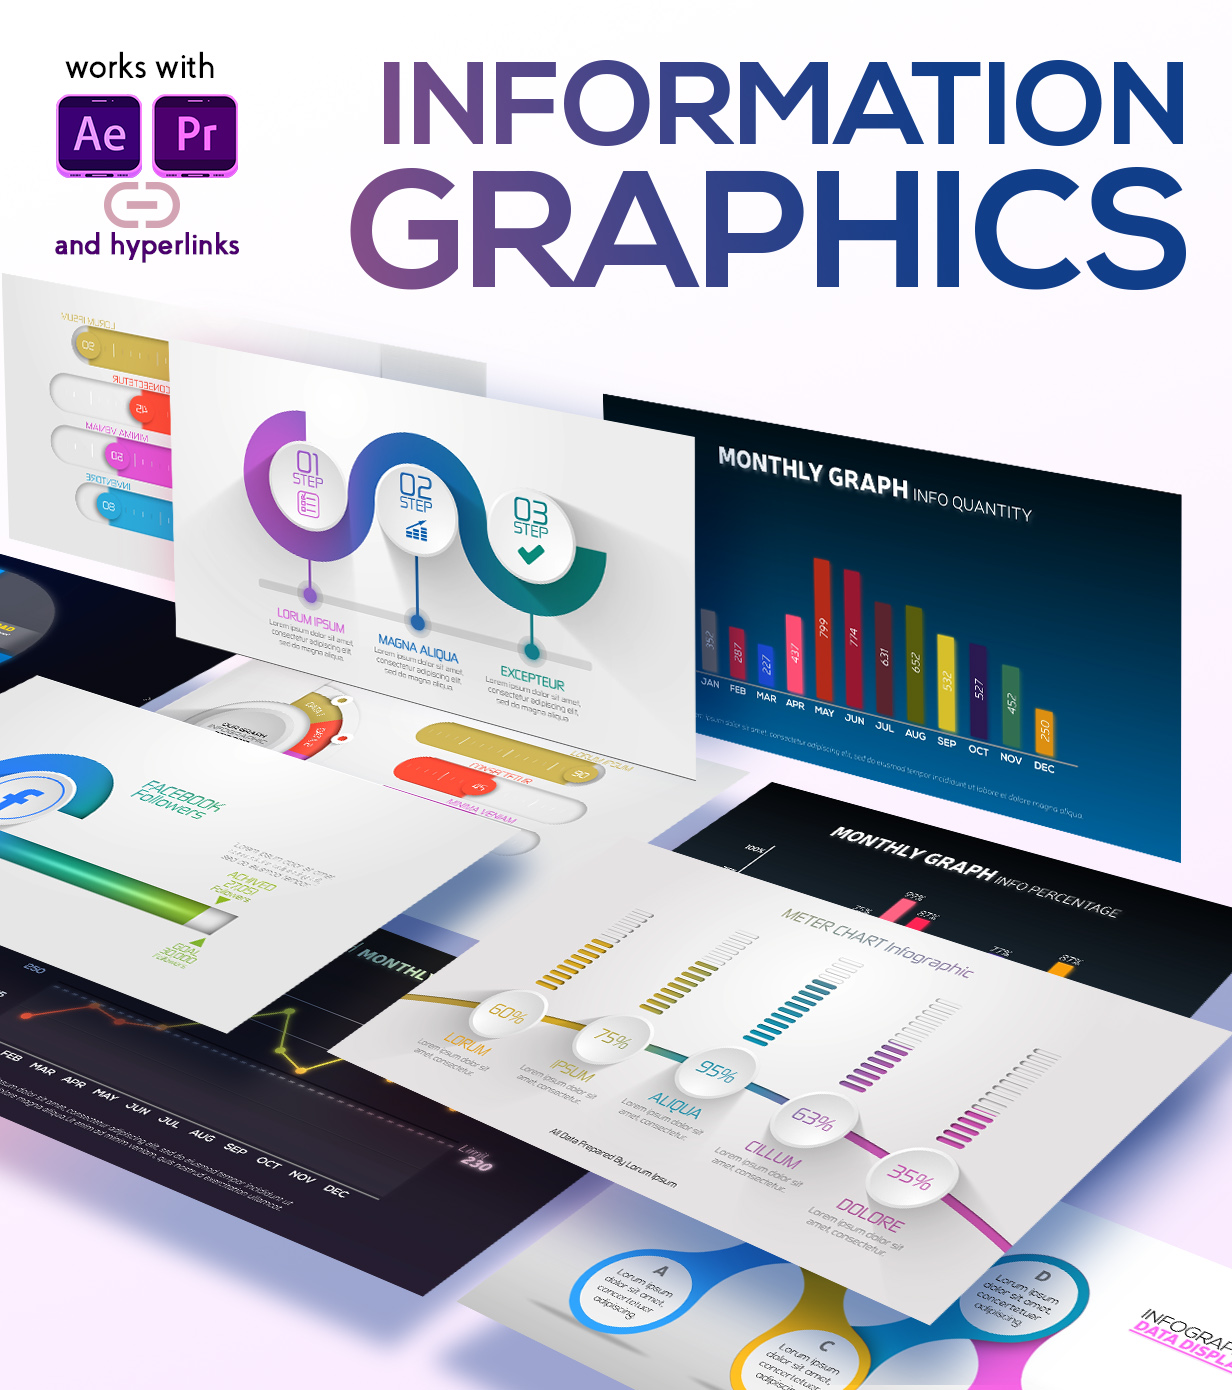 The Graphics - 3